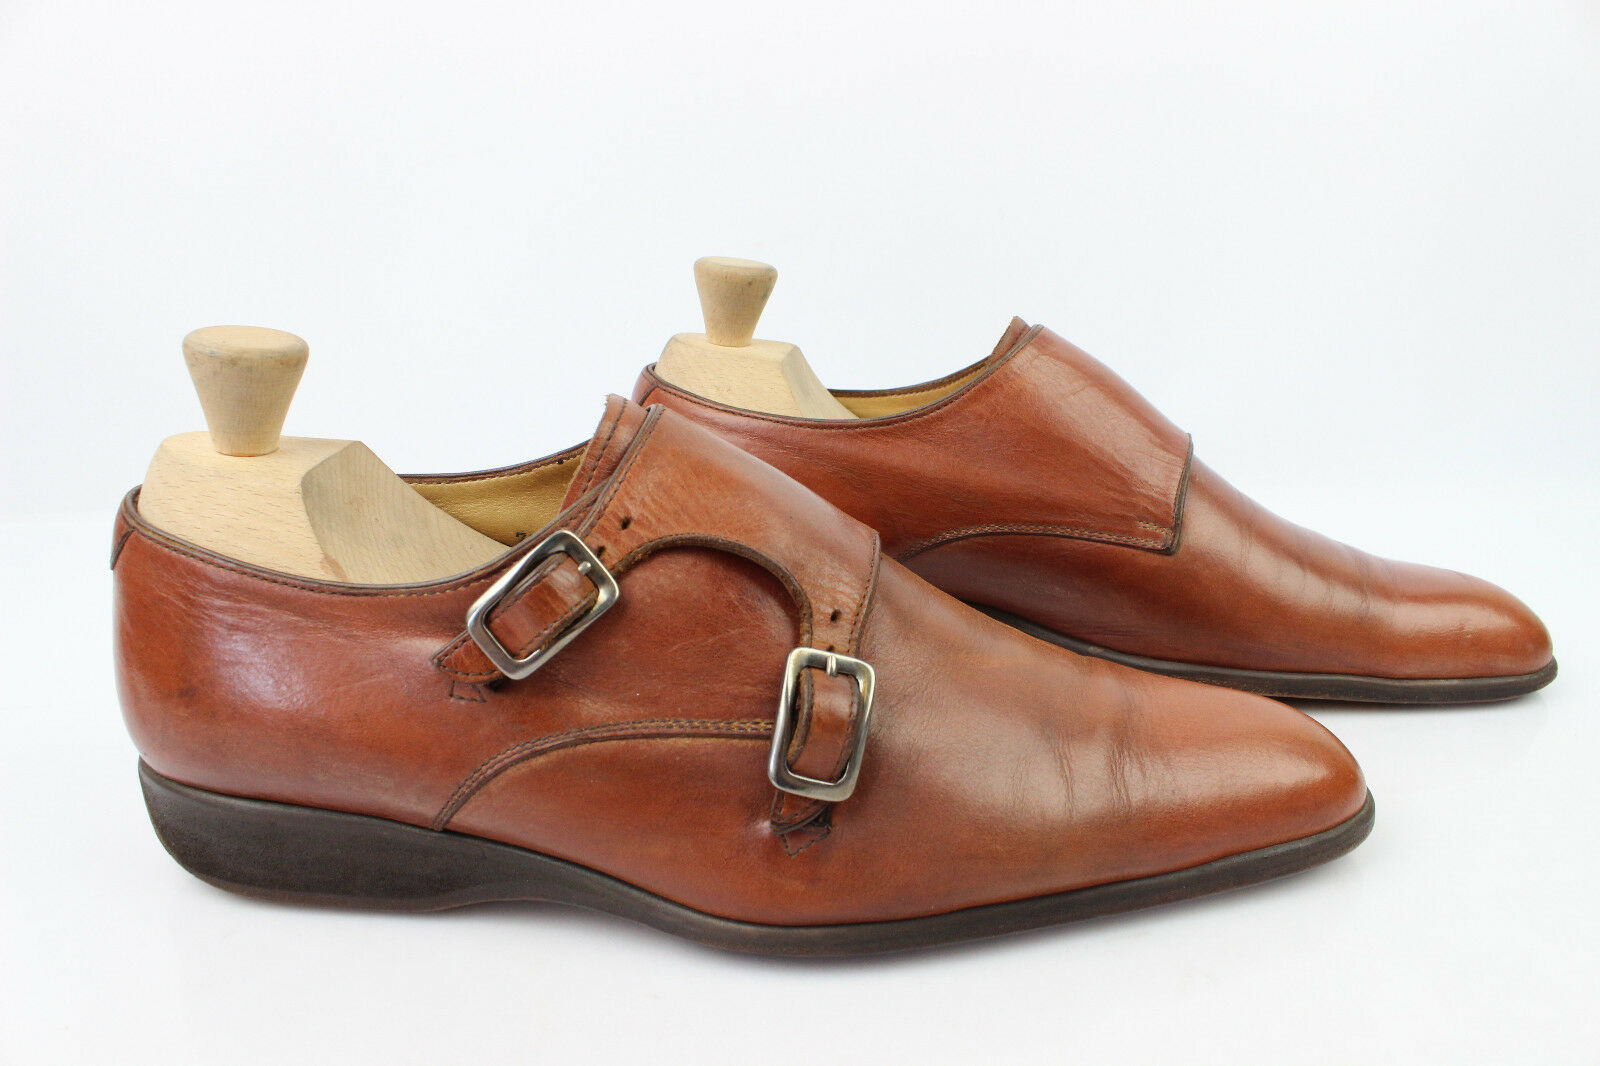 Oxfordschuhe Schnallen alle Leder braun UK 7,5 / guter Zustand